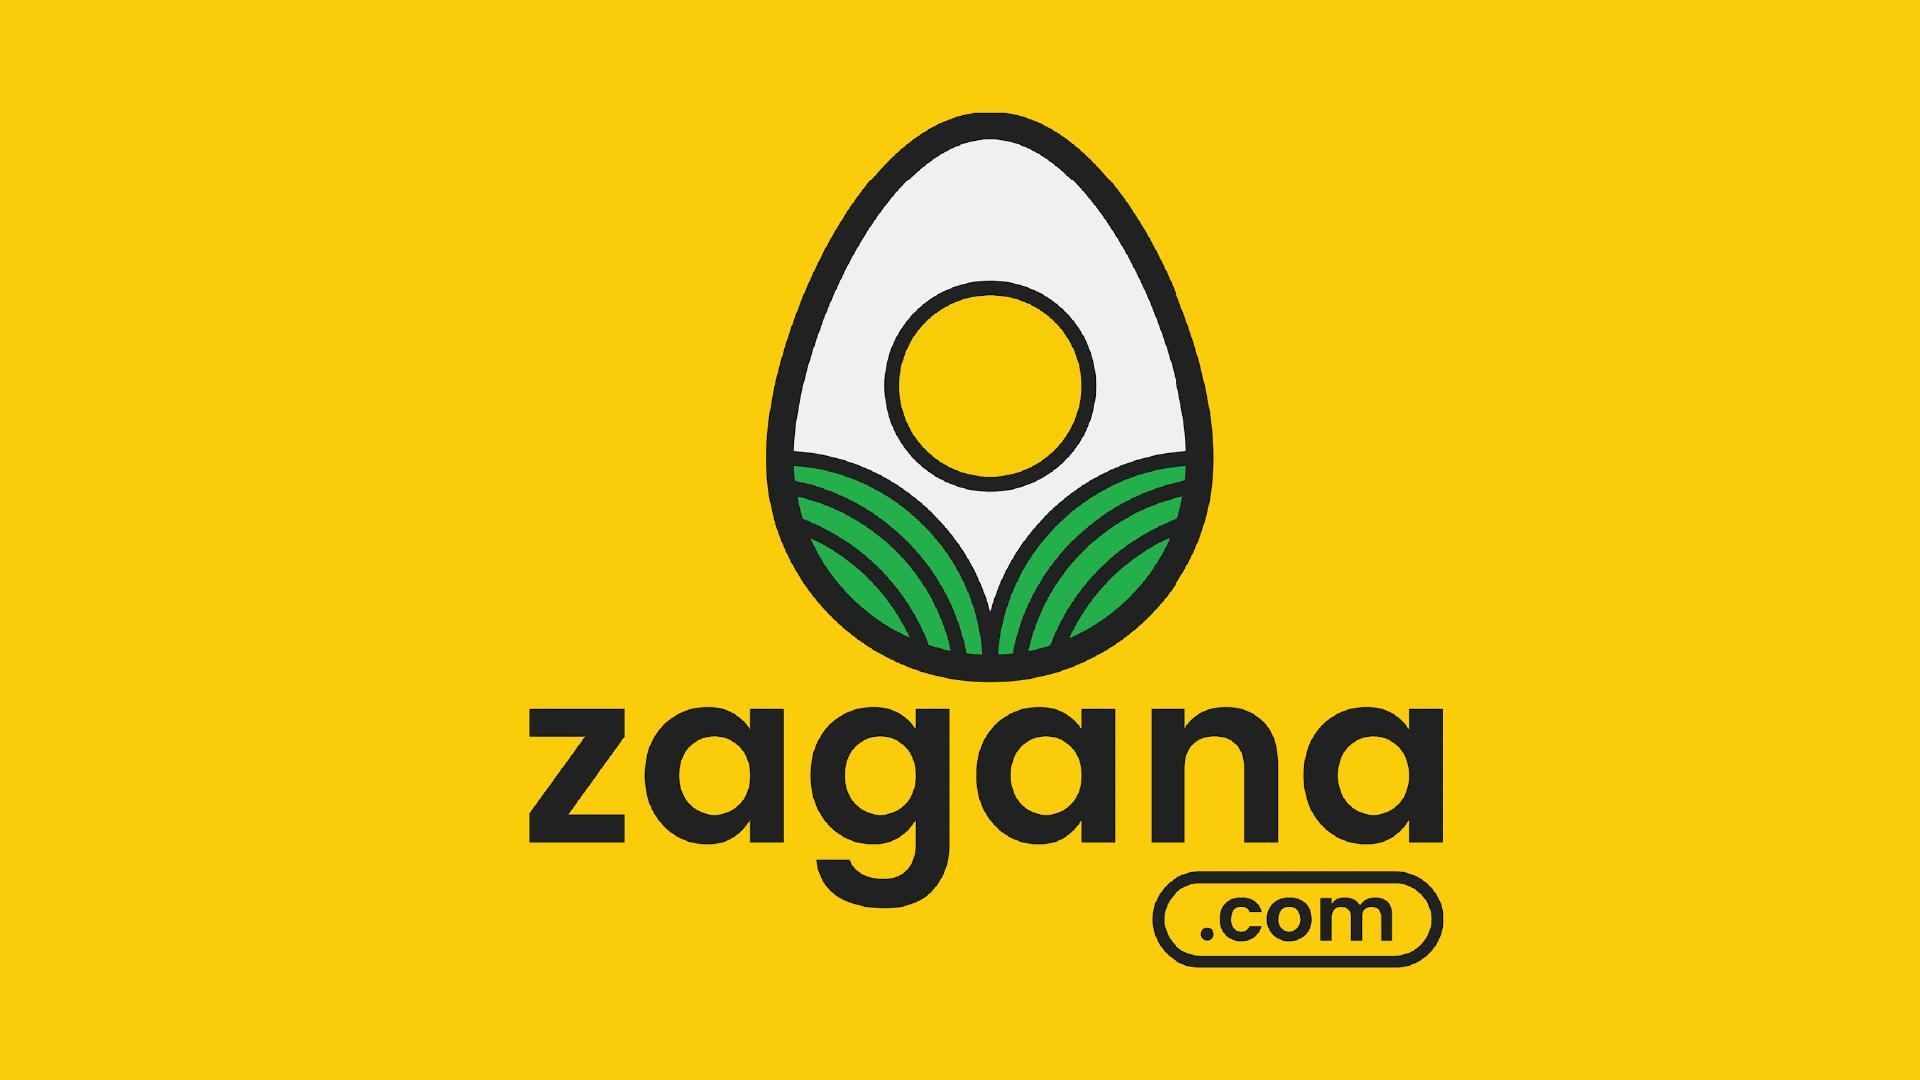 Zagana transitions to AWS uplifting the lives of Filipino farmers